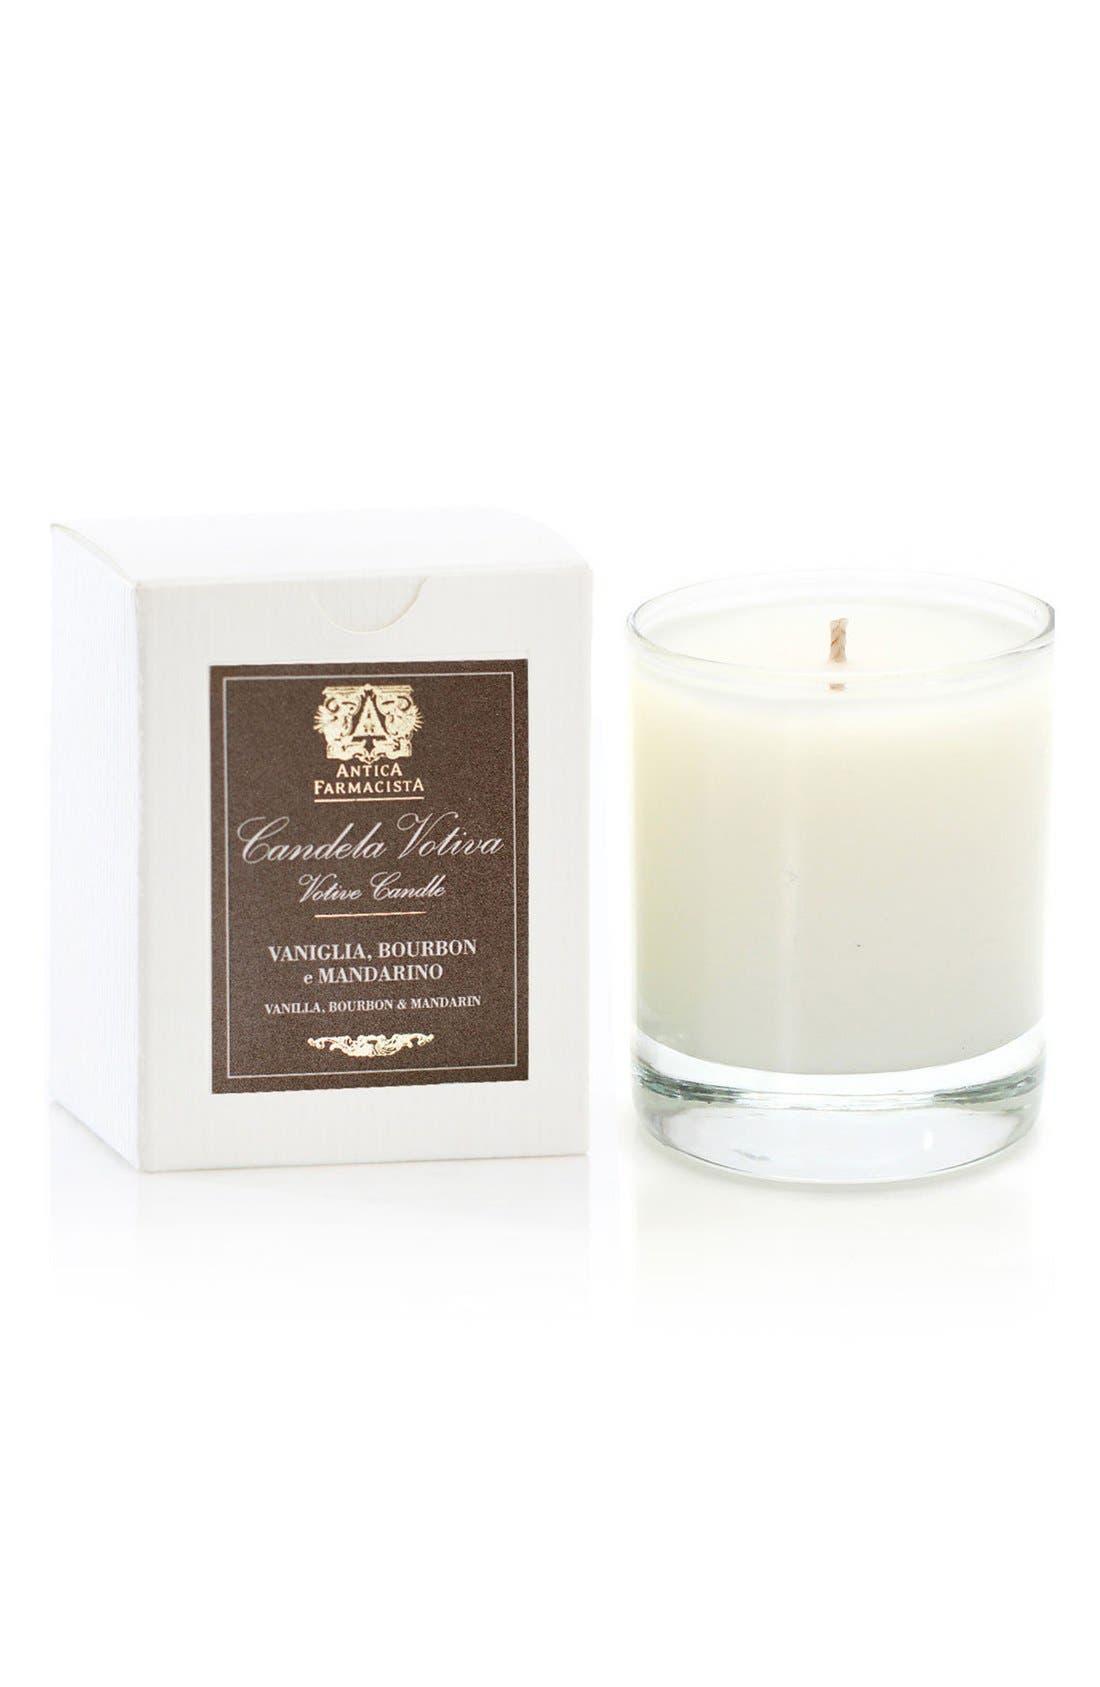 Antica Farmacista Vanilla, Bourbon & Mandarin Votive Candle